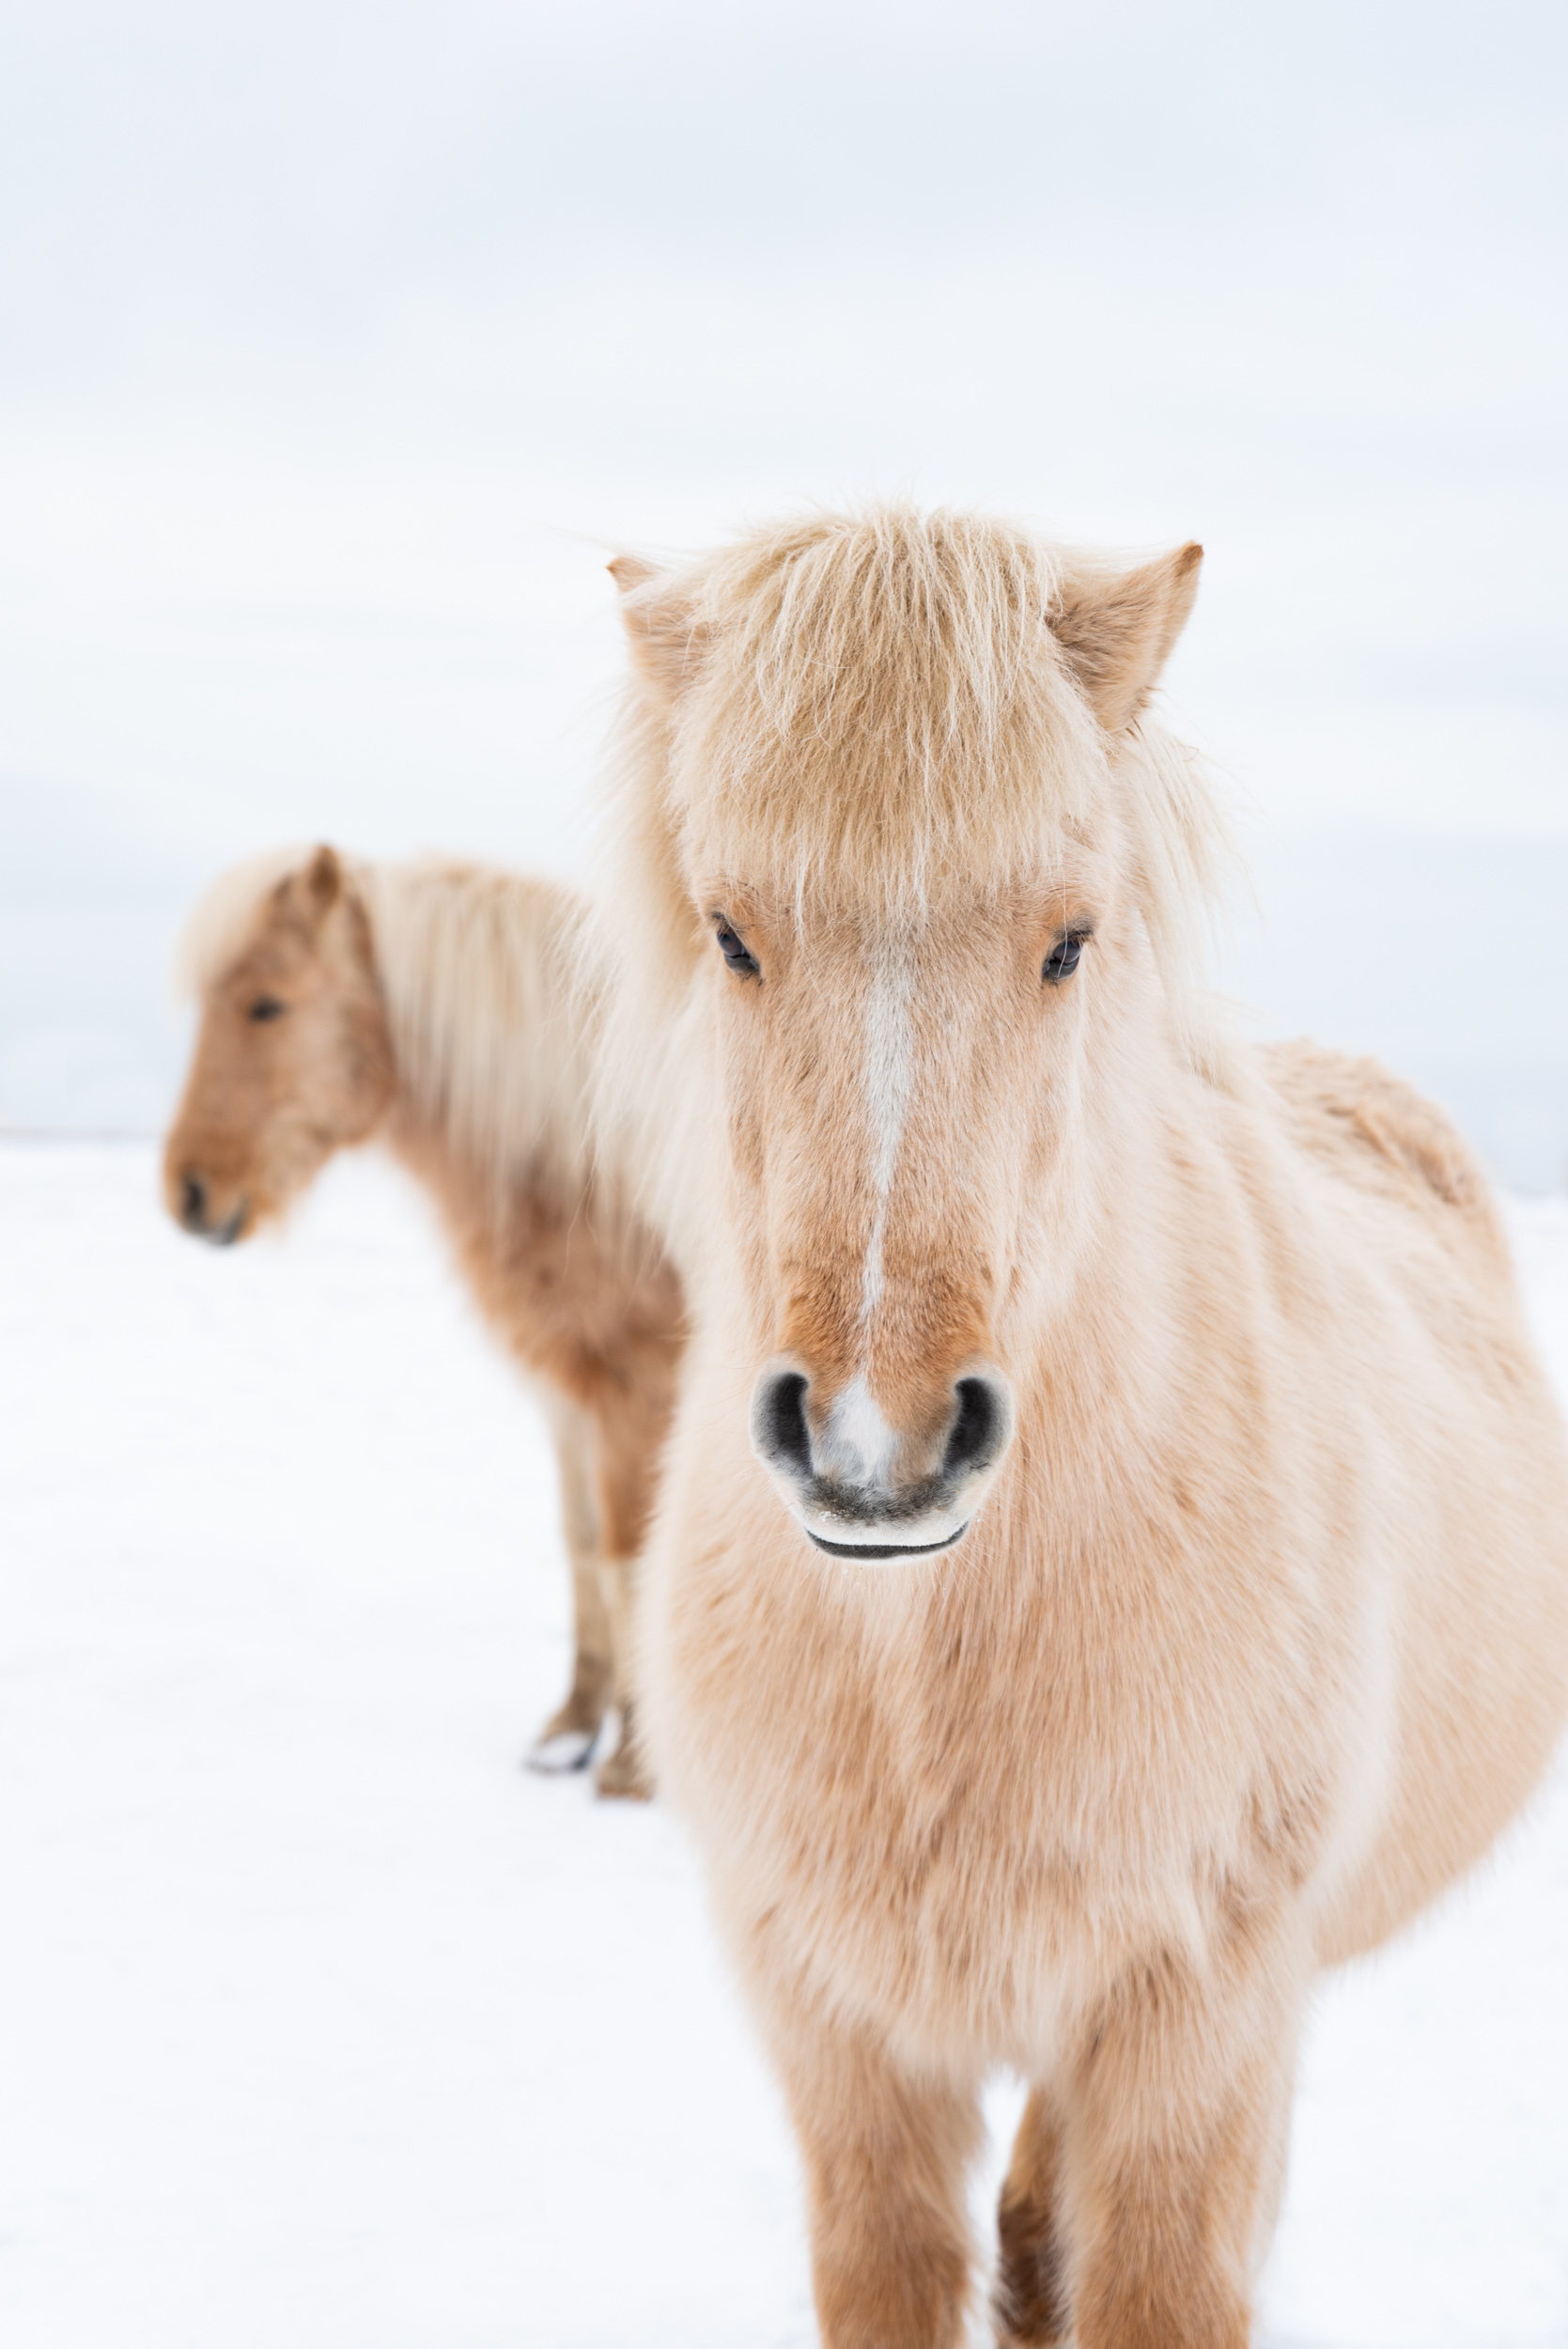 Horse, Horses, Icelandic Horse, Iceland Horse, Icelandic, Iceland, Brad Geddes Photography